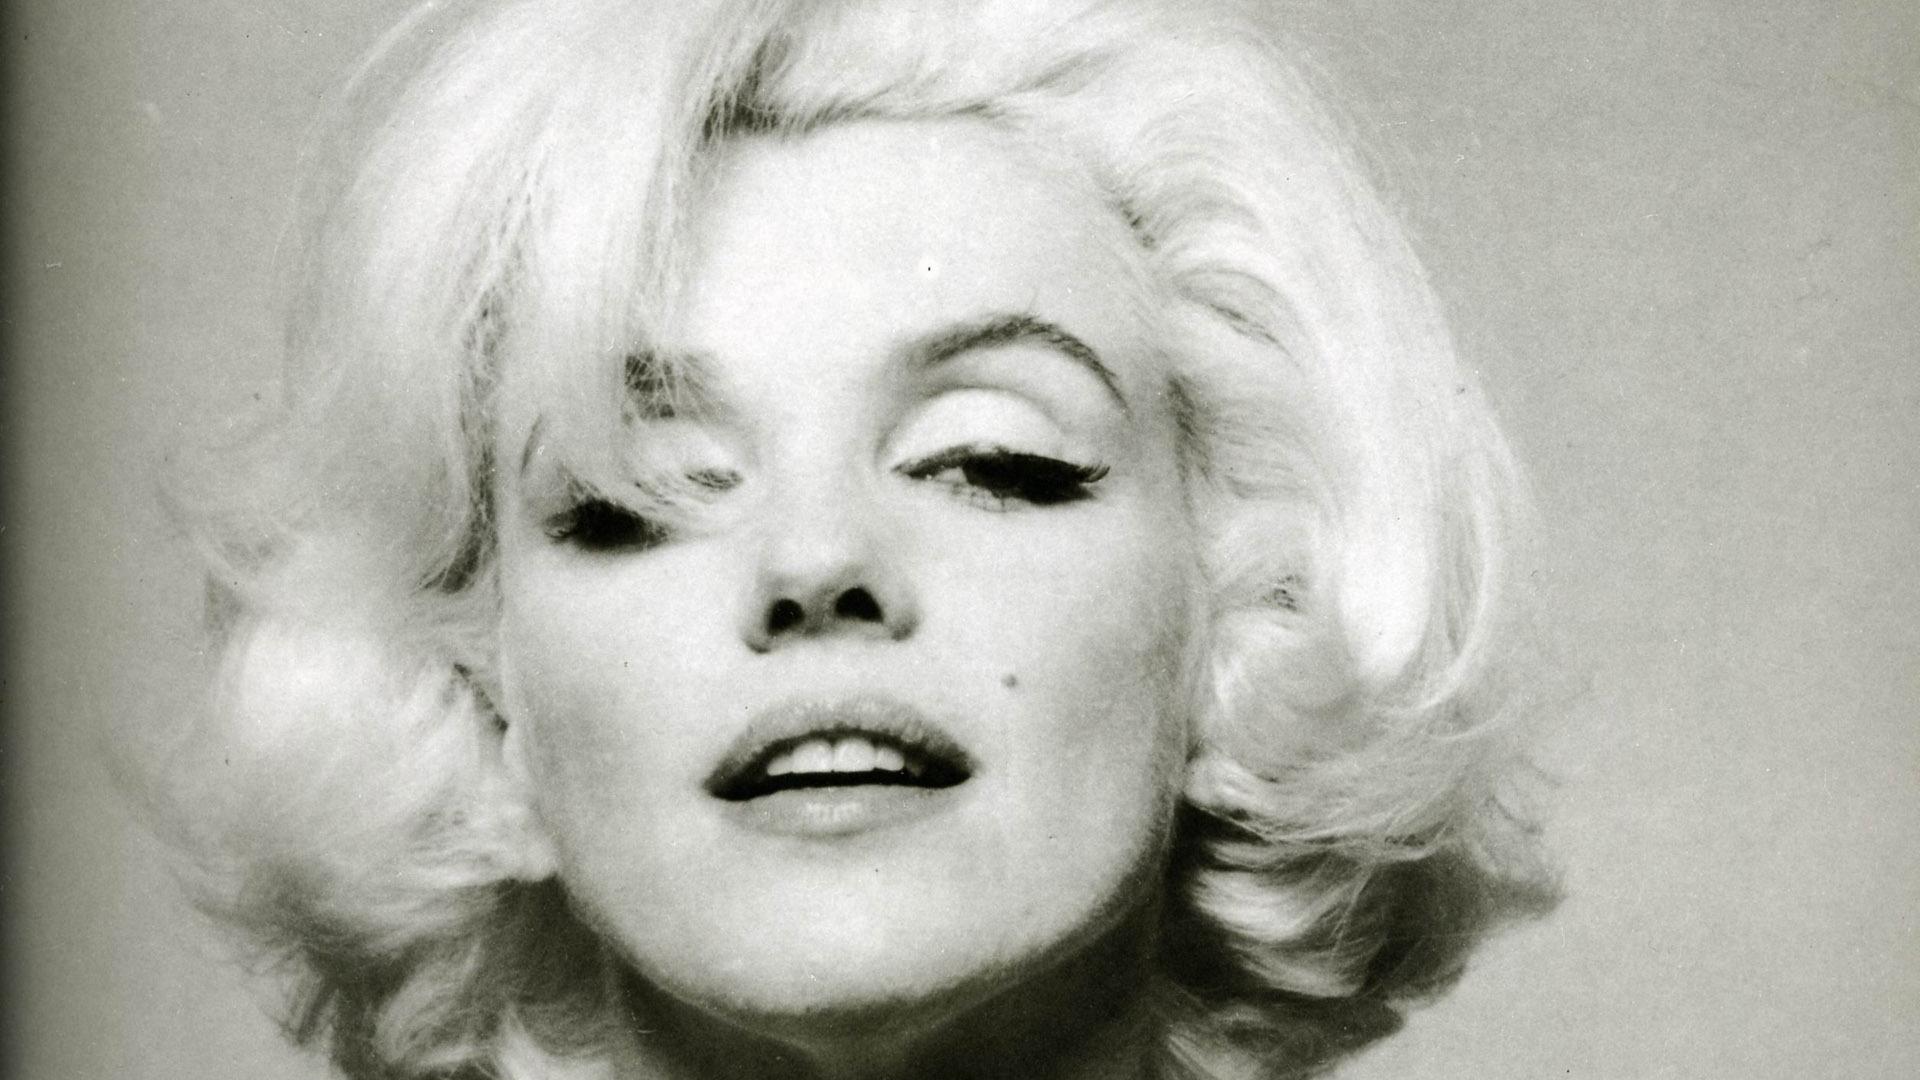 Image Result For Hd Marilyn Monroe Wallpaper Marilyn Monroe Hd Desktop Wallpaper Widescreen High Definition